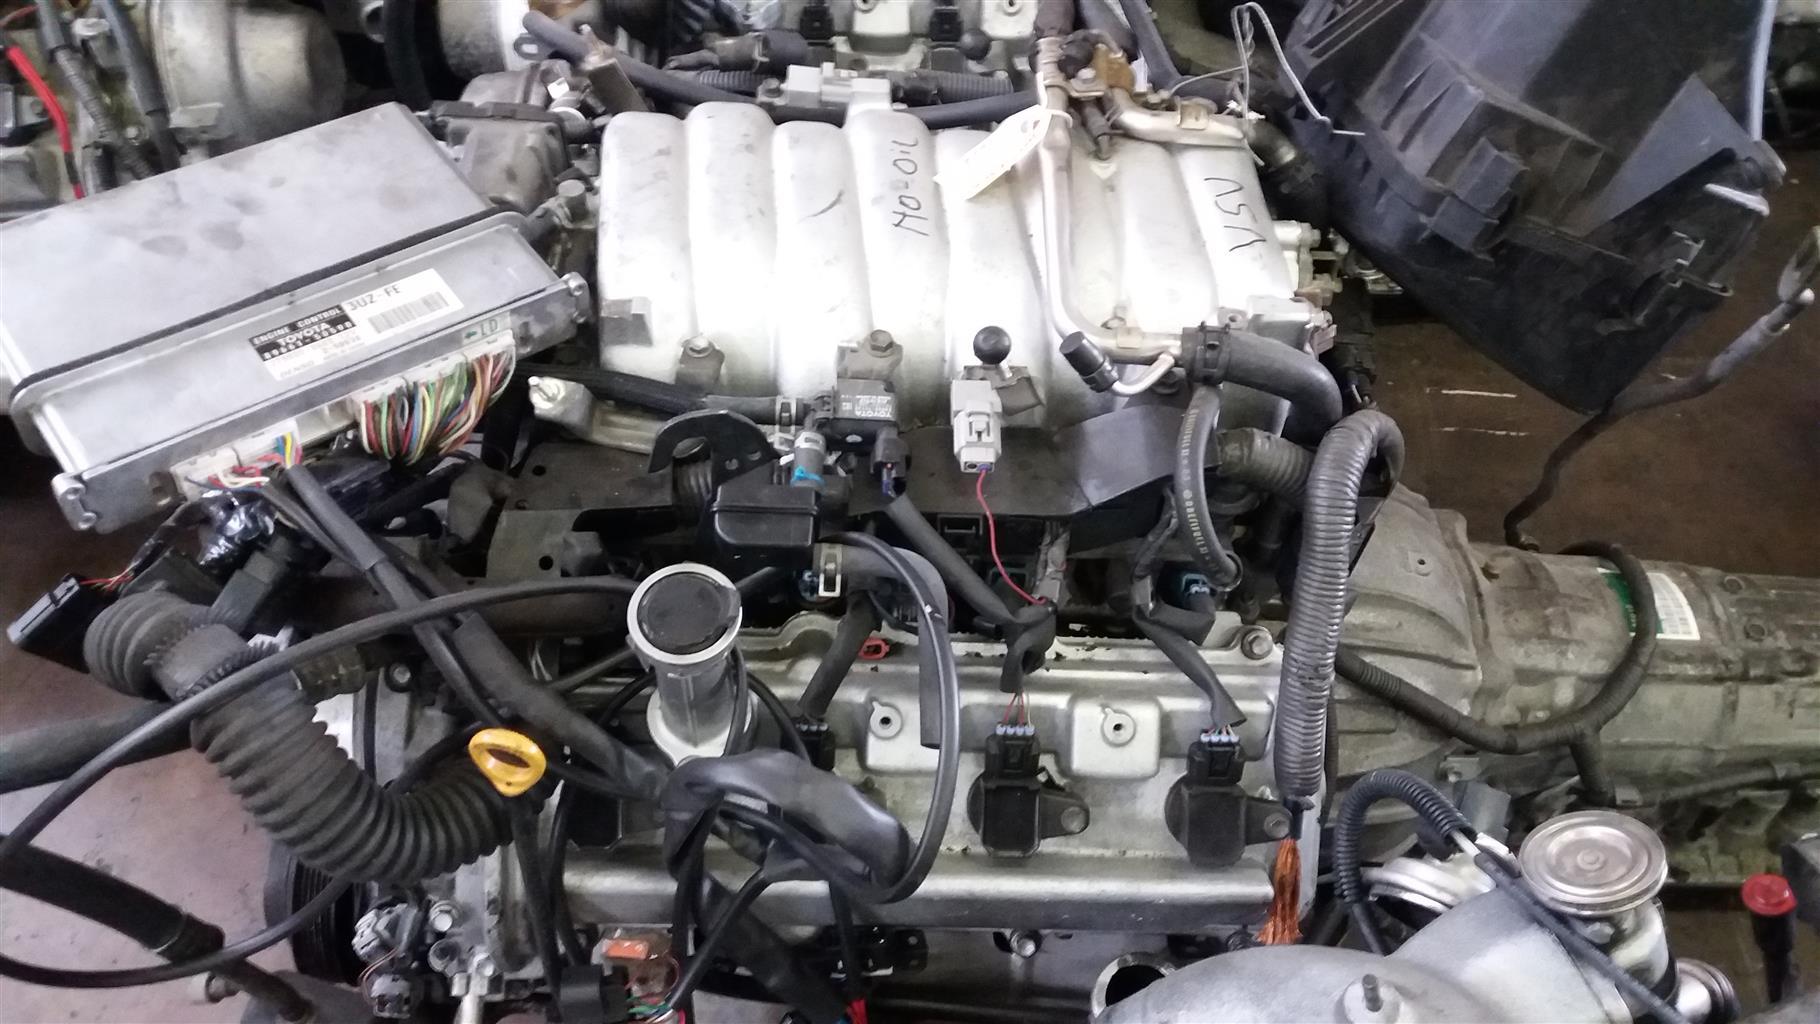 Lexus 4.3 V8 Prewired VVTi Engine & Auto Gearbox # 3UZ